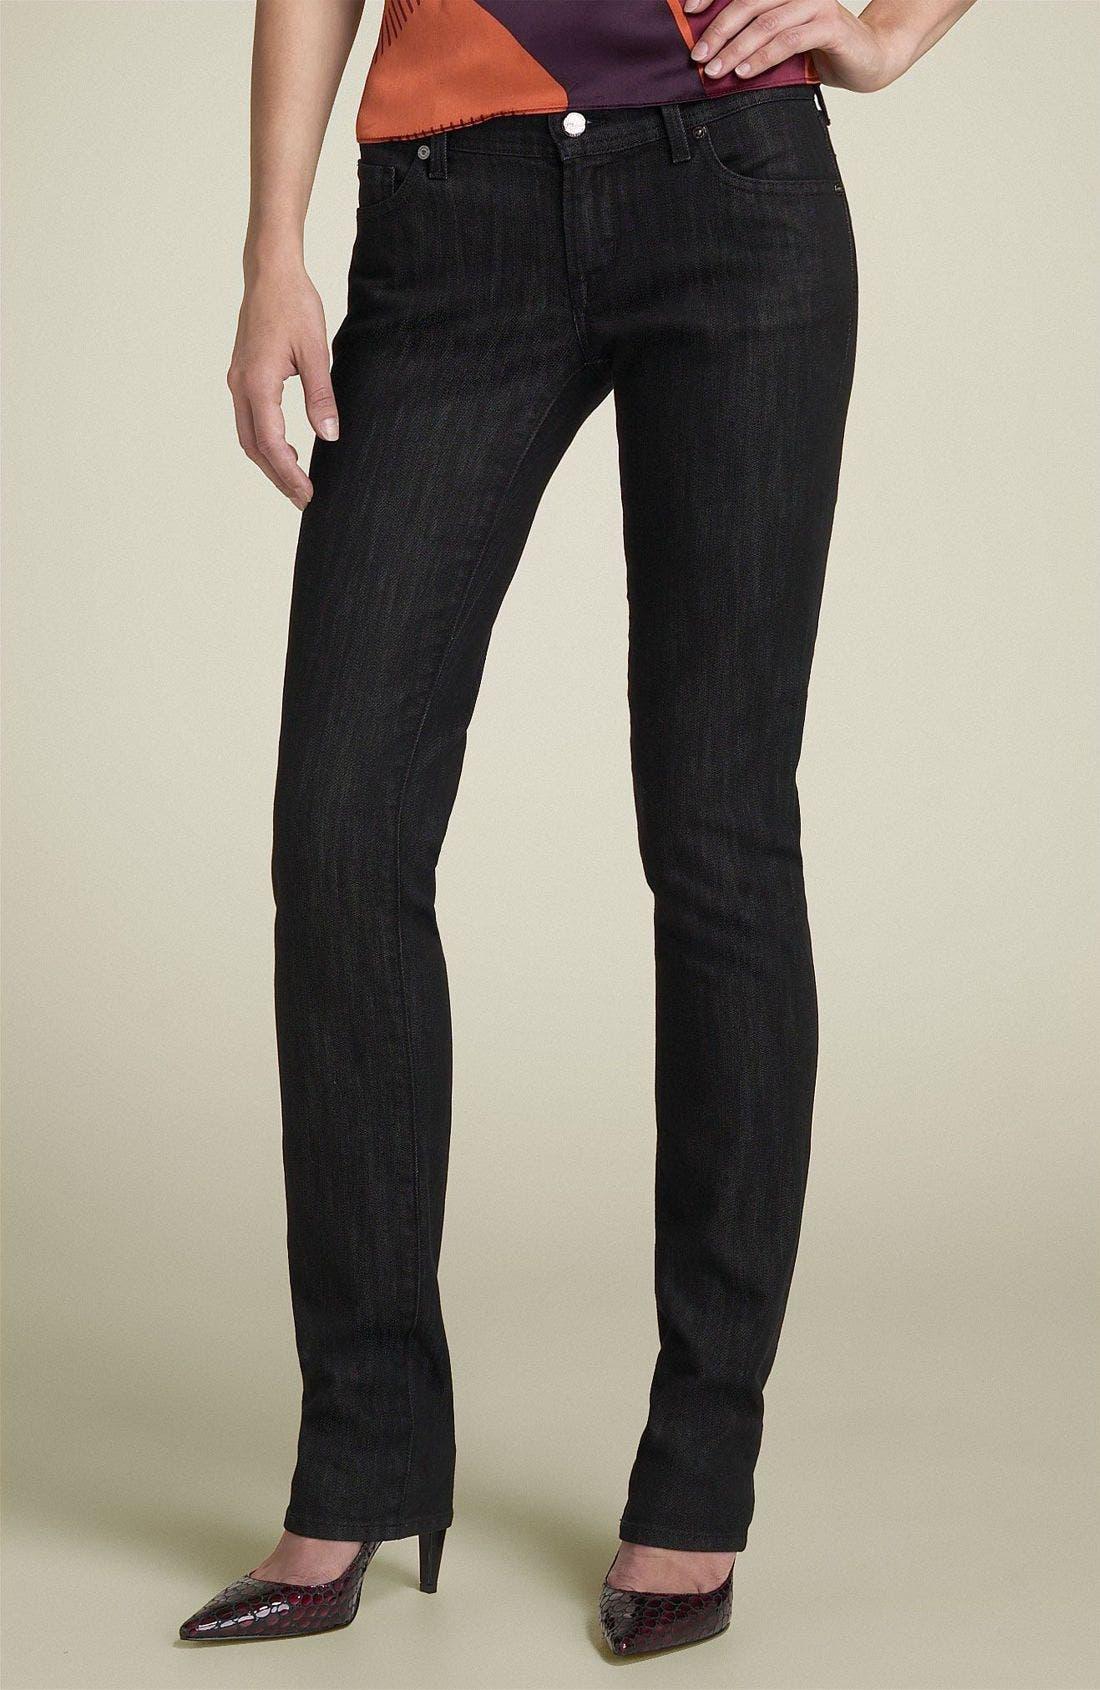 'Ava' Straight Leg Stretch Jeans,                             Alternate thumbnail 2, color,                             007